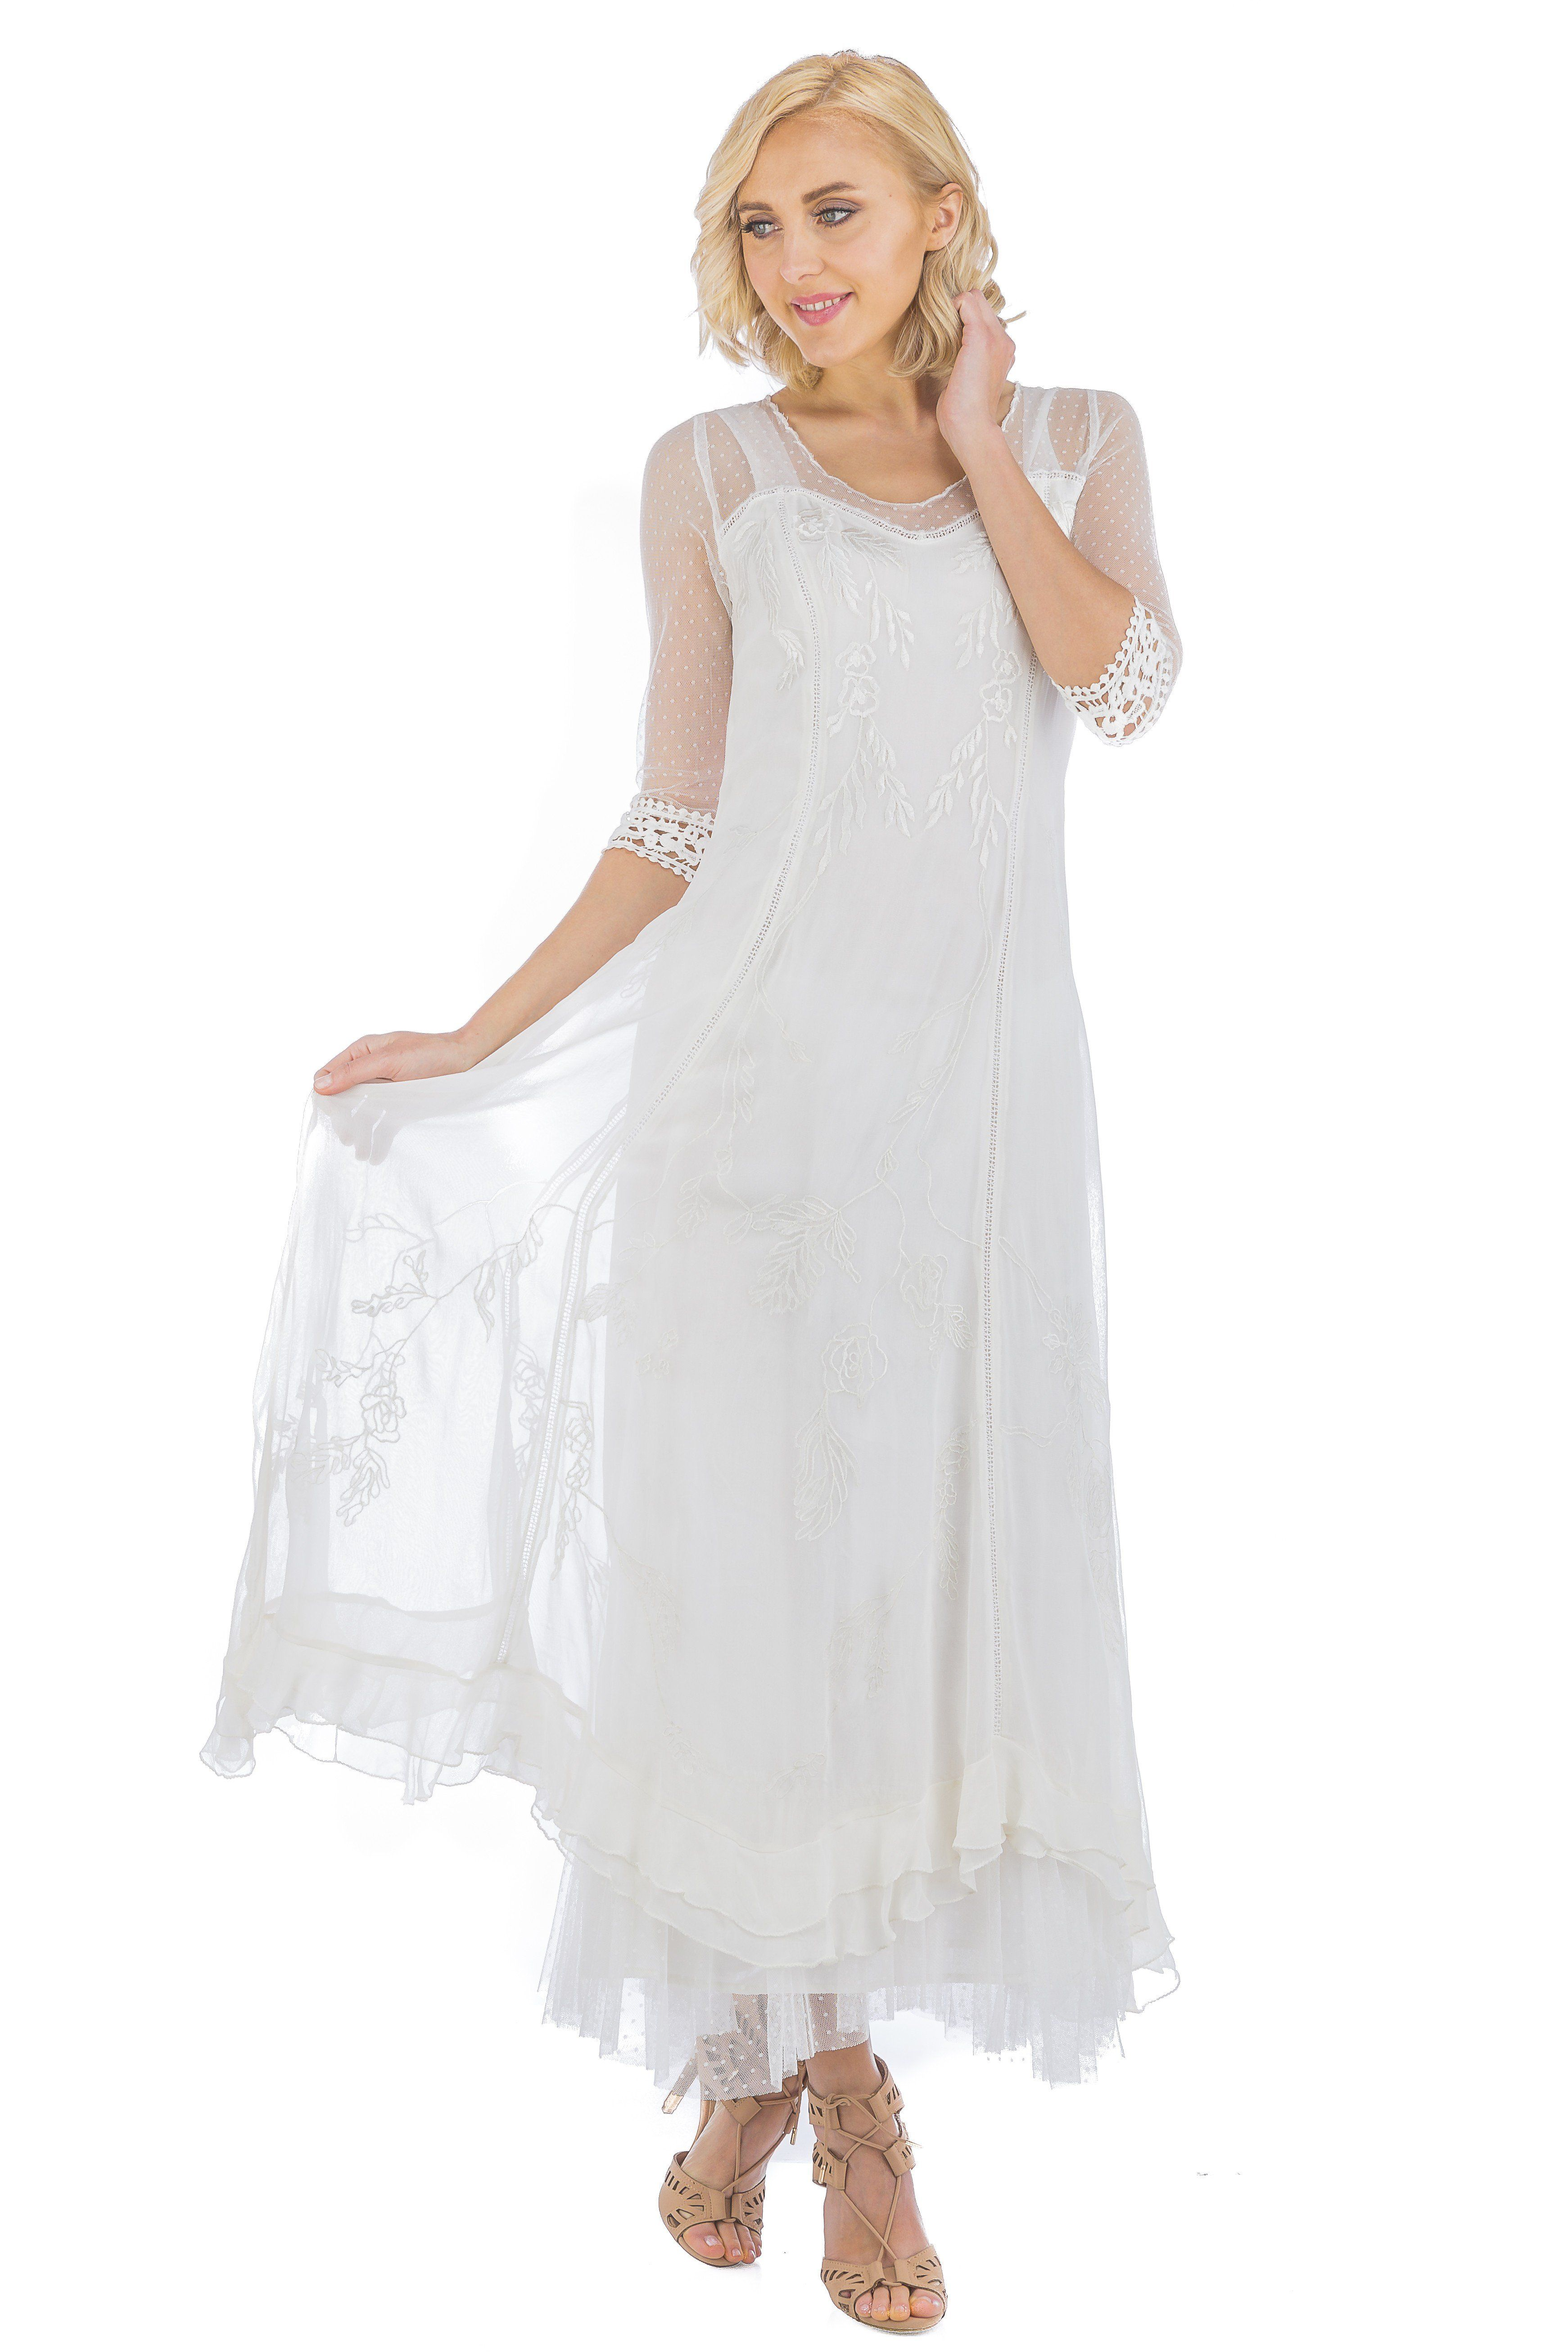 2ca651d5038b Vintage style wedding dress - white lace long 1910s to 1930s, boho style  wedding dress